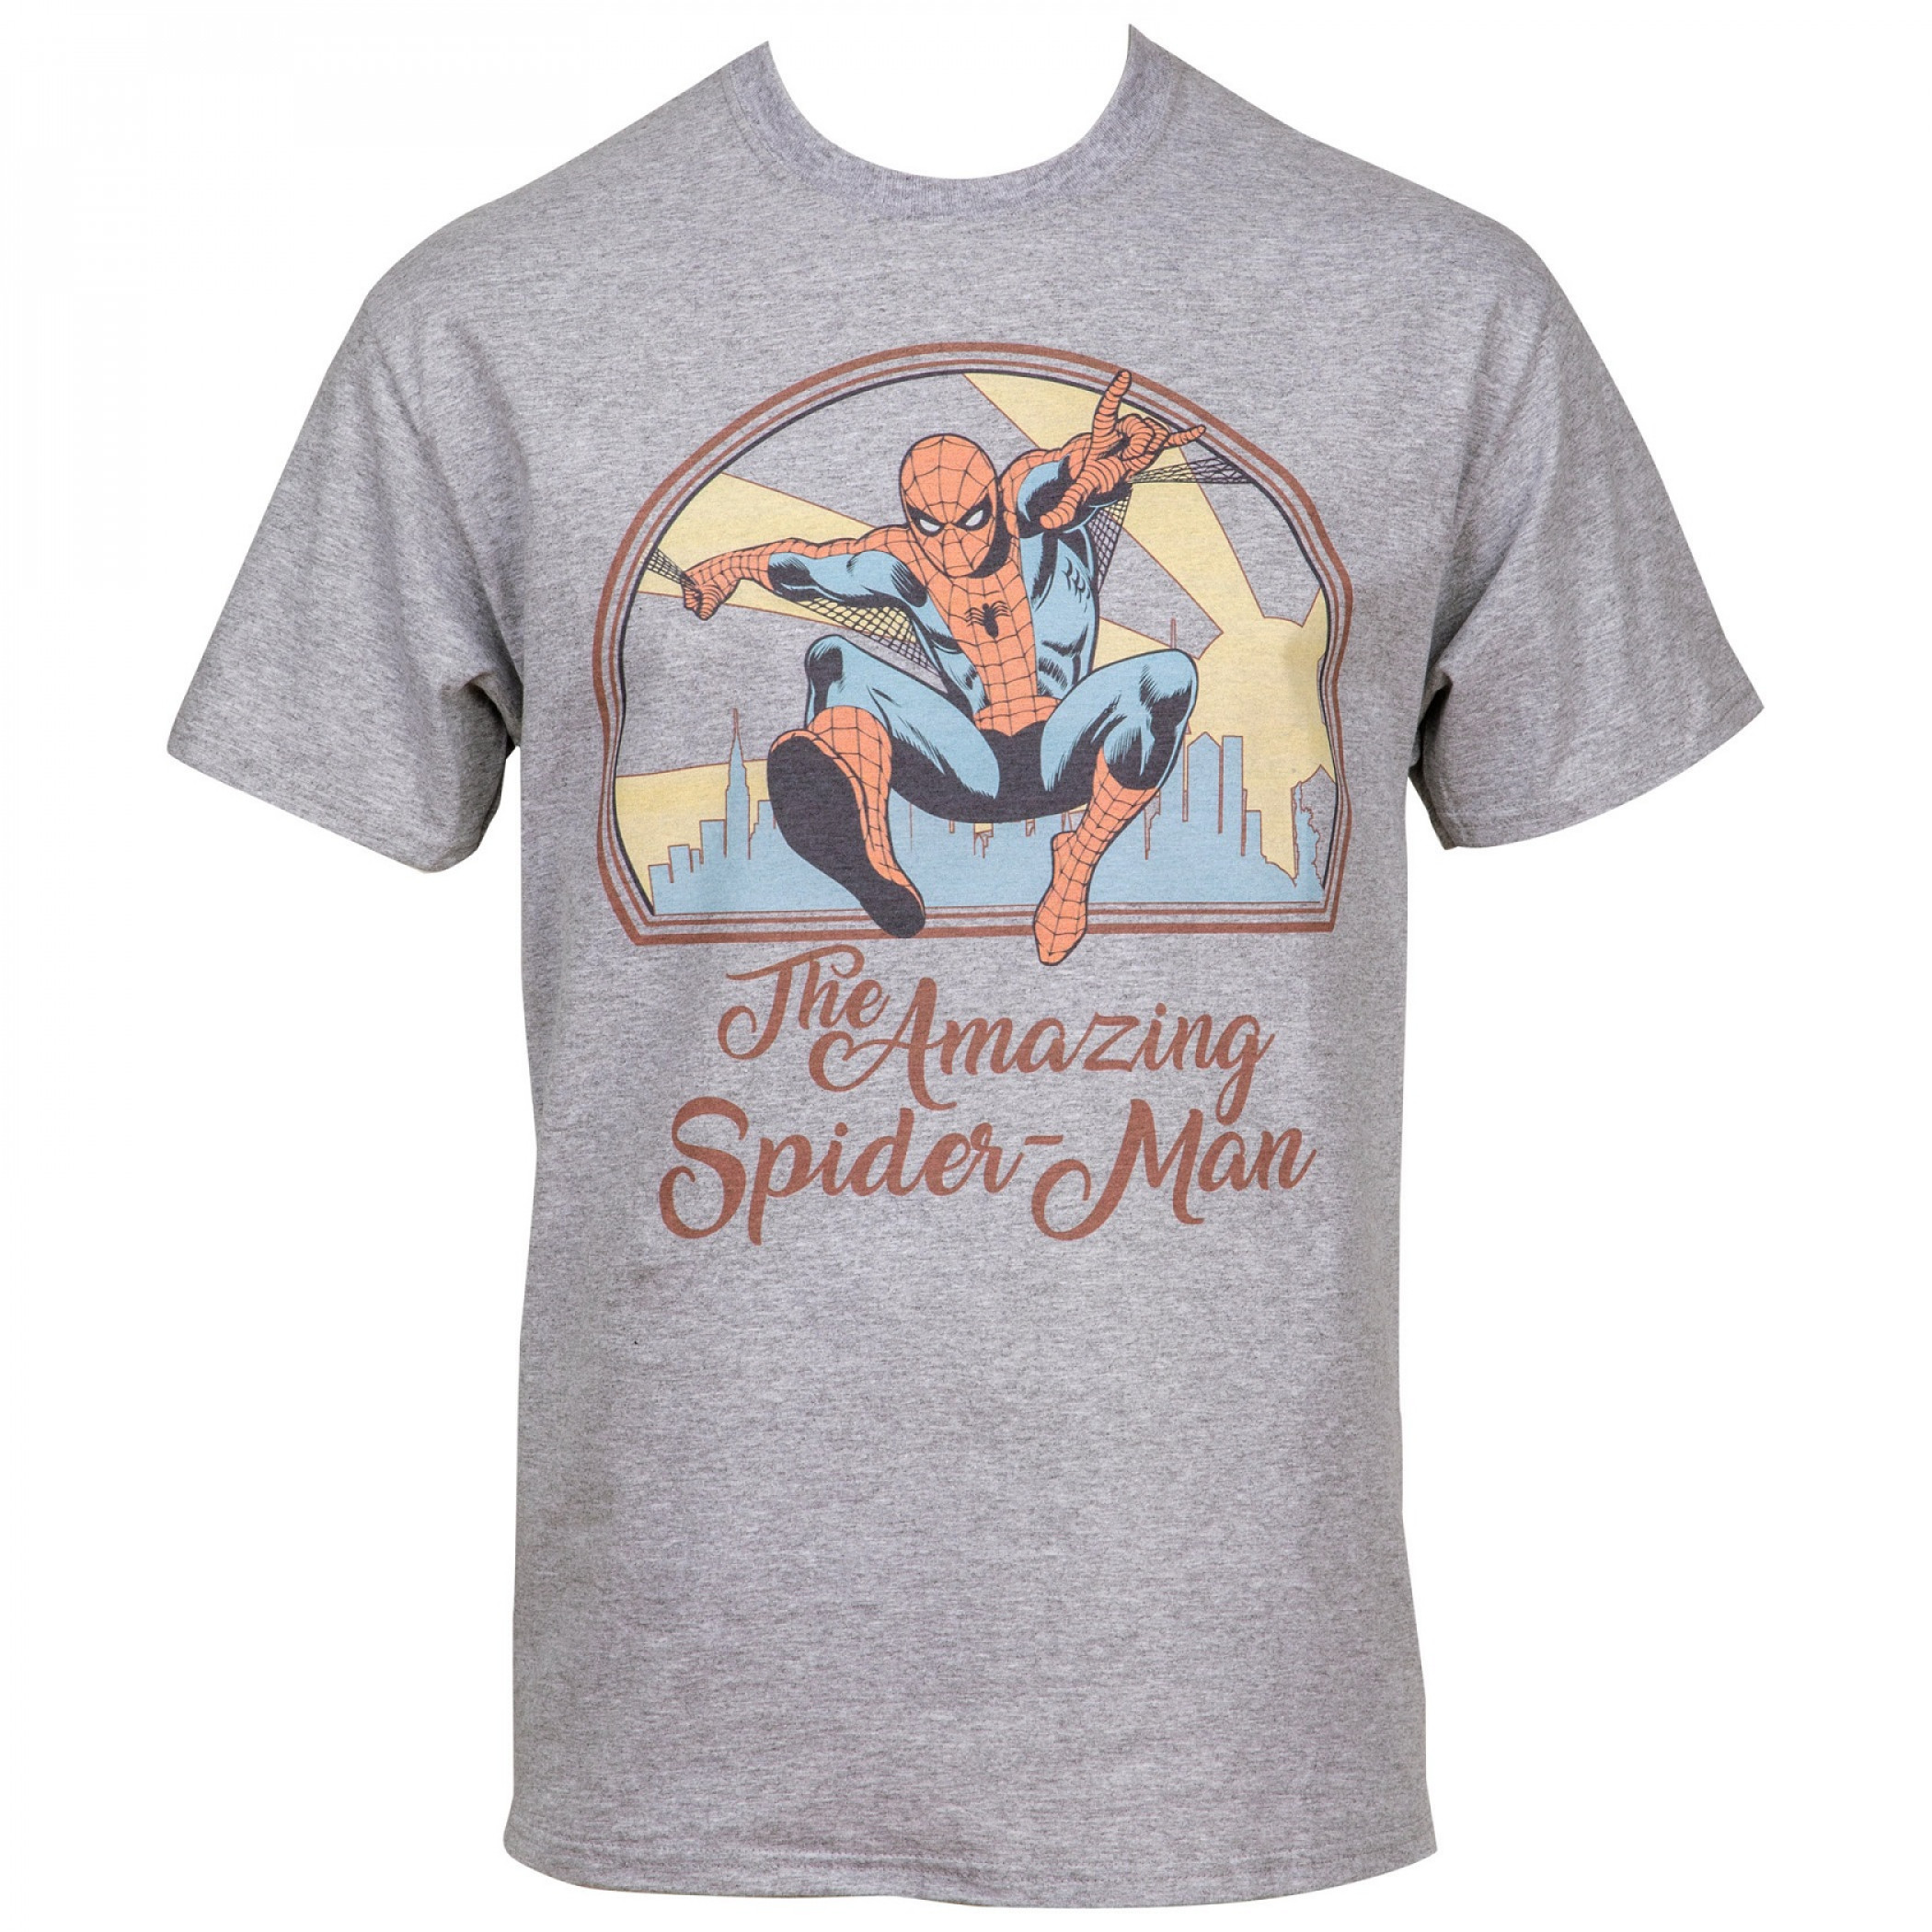 The Amazing Spider-Man Swinging Through The City Men's T-Shirt